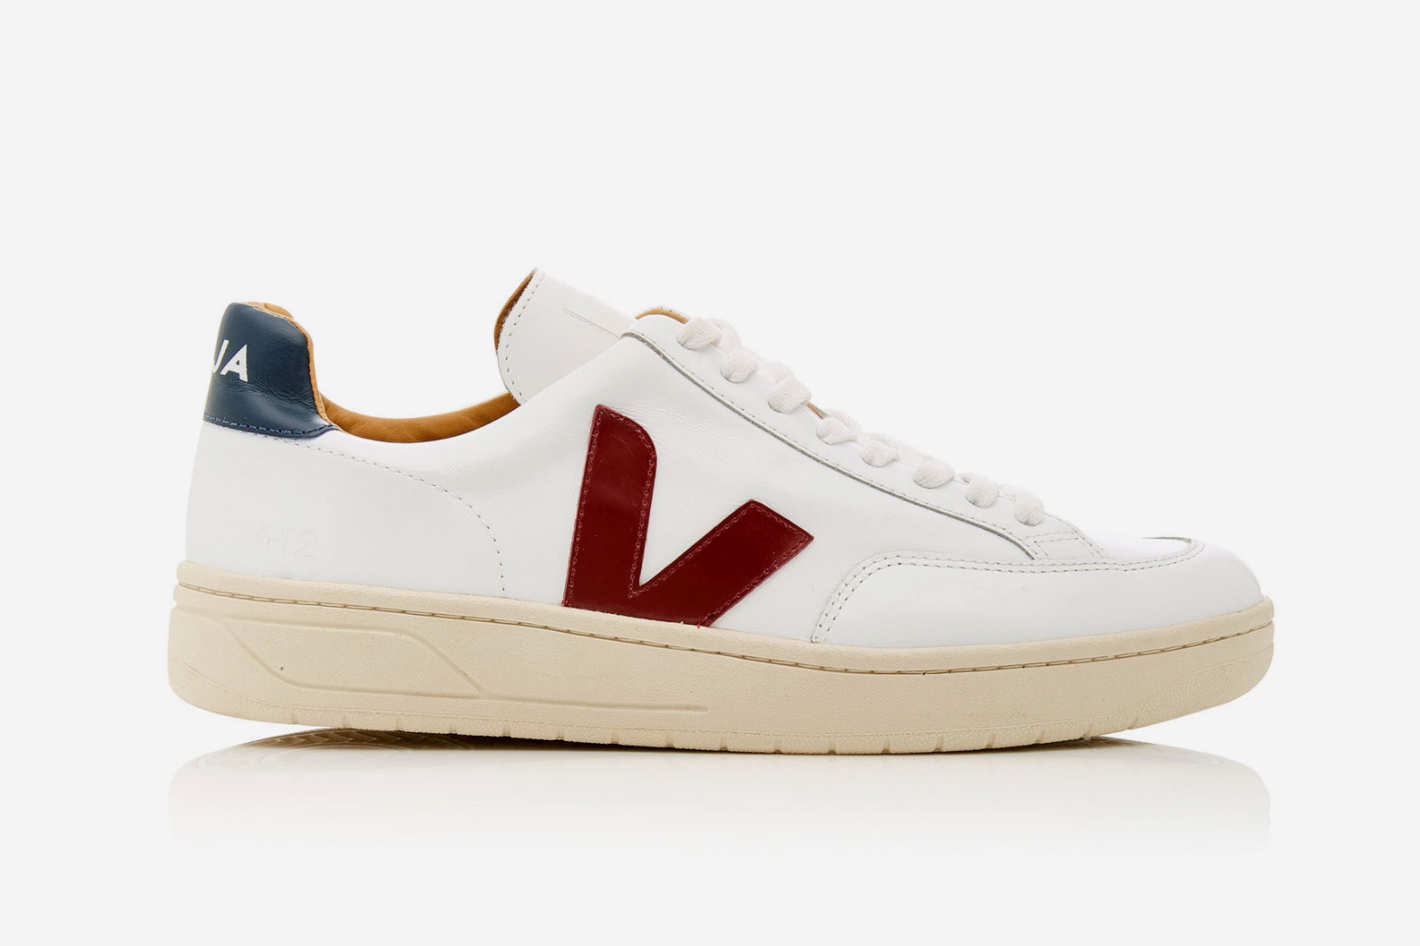 Veja Bastille Two-Tone Leather Sneaker